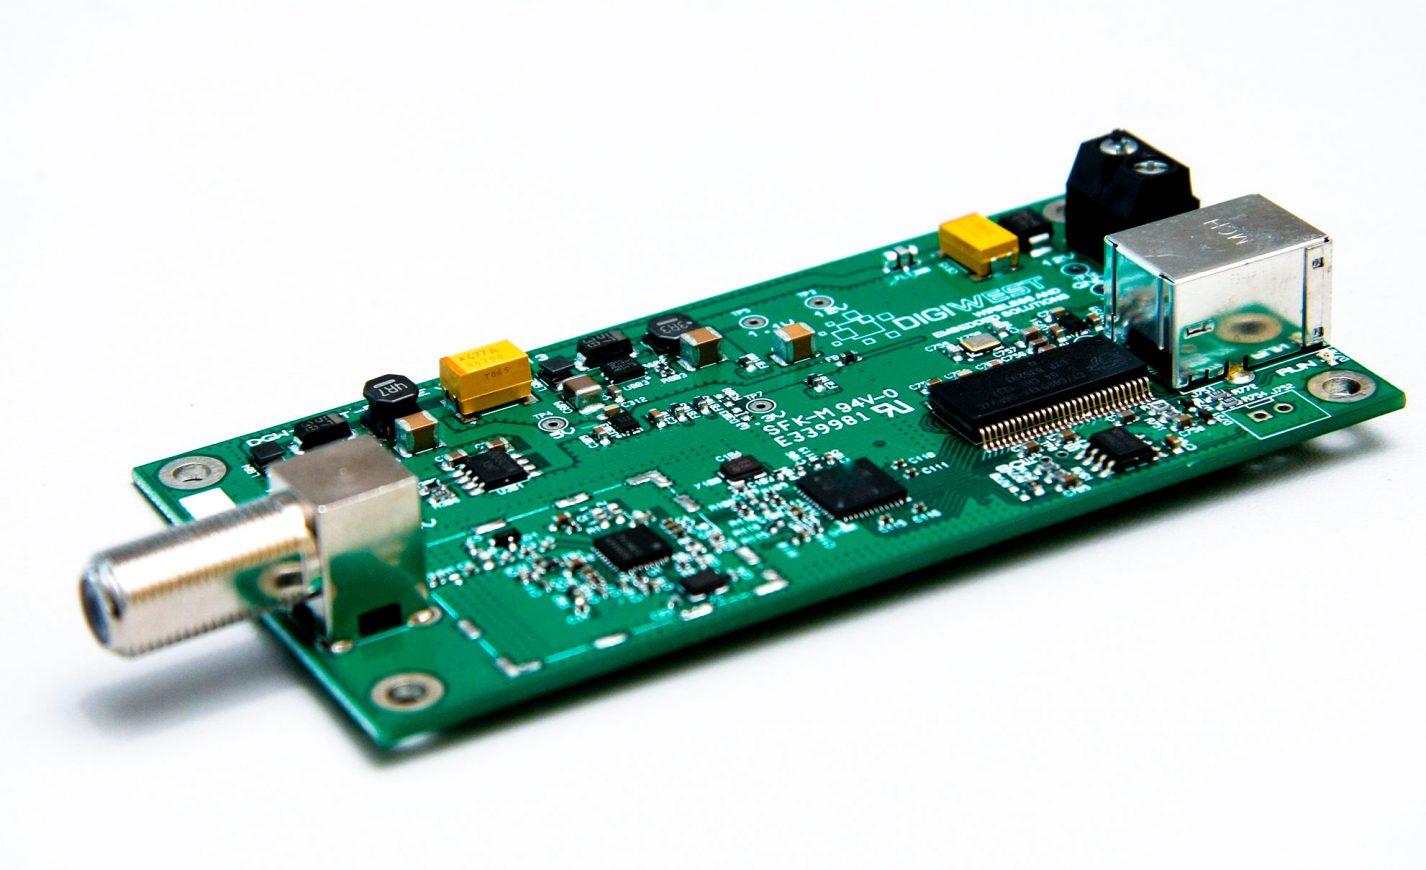 Sonda-DVB-T-portfolio-01